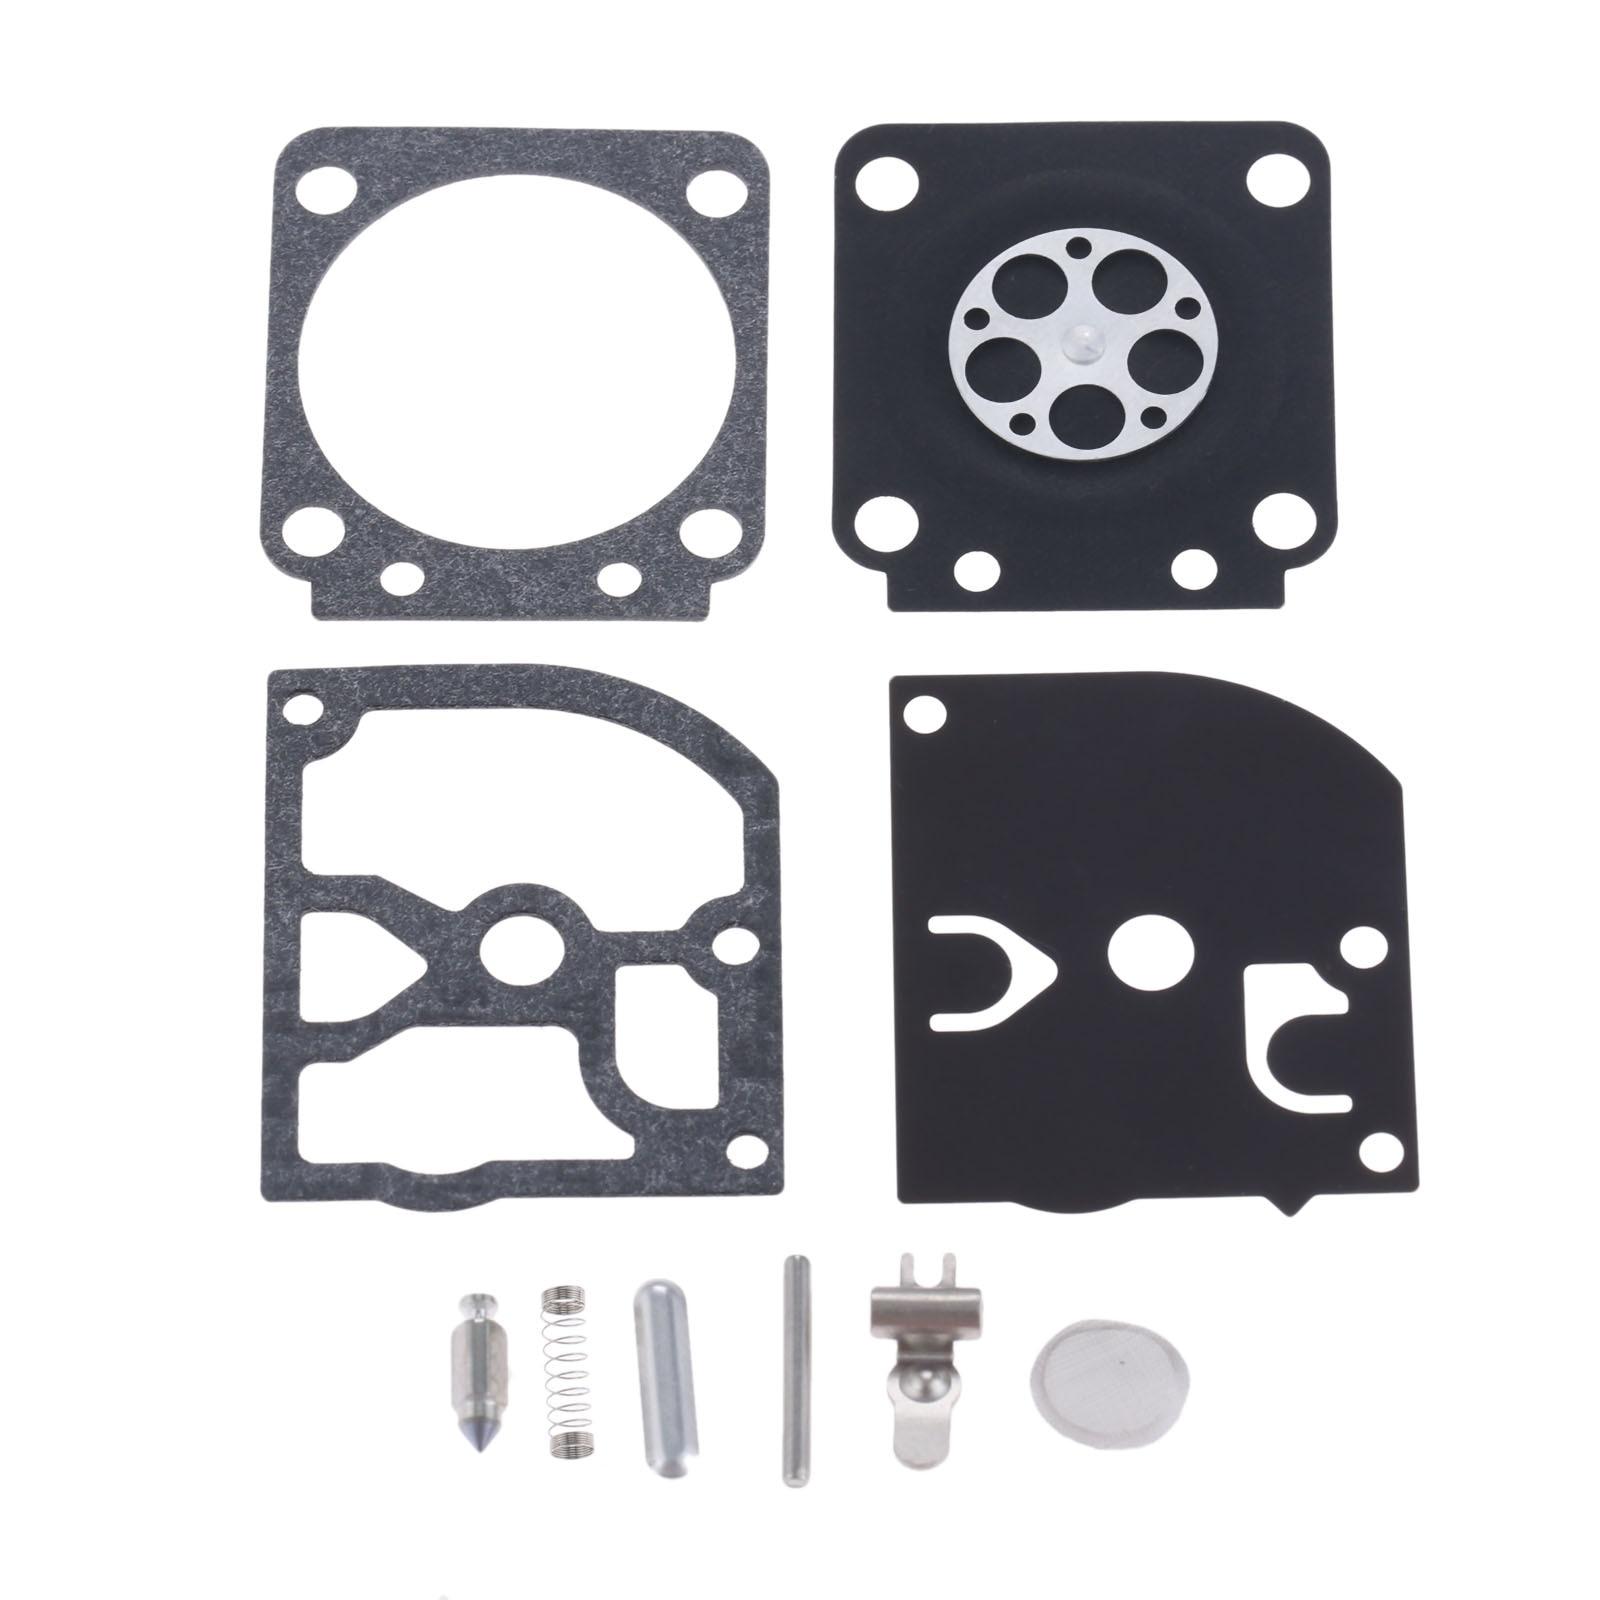 DRELD RB-129 Carburetor Carb Repair Rebuild Kit Fit For ZAMA RB-129 C1M-W26 A-C SERIES CARBS TRIMMER CHAINSAWS PARTS Engine